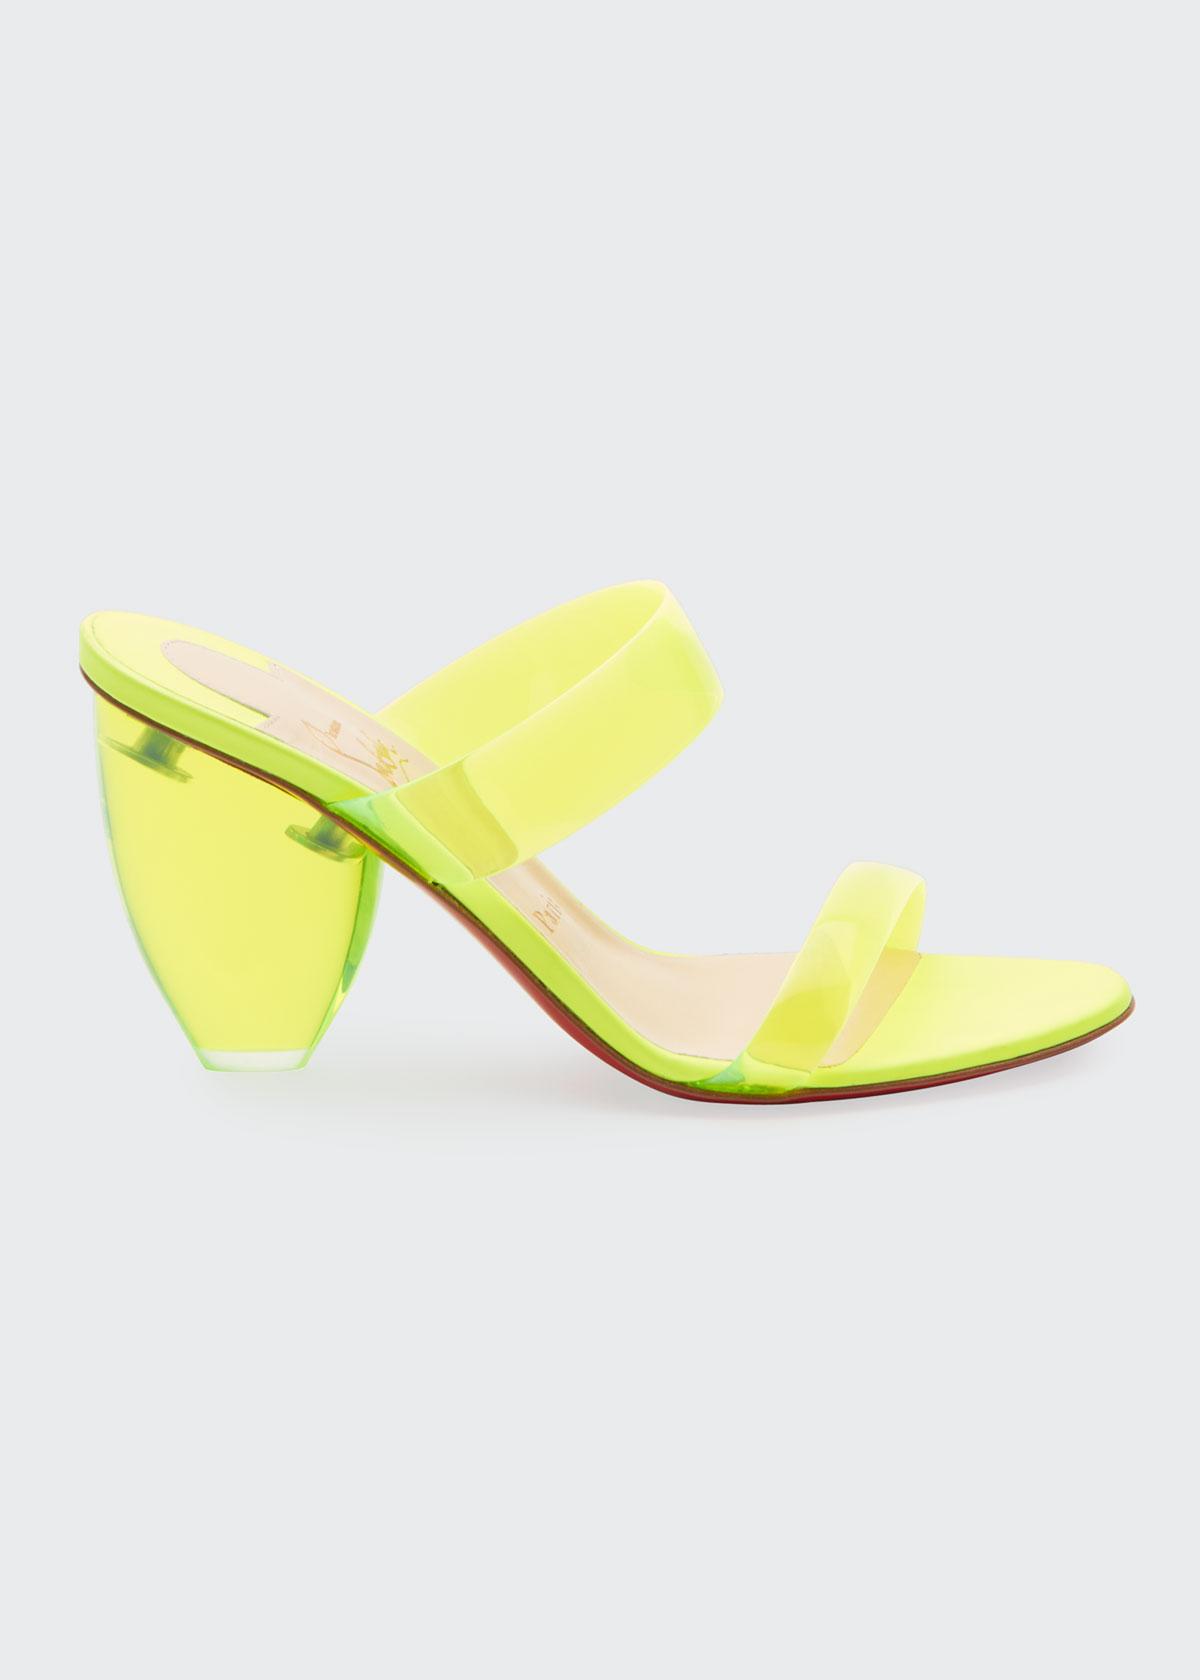 Christian Louboutin Mid heels OVIDA PVC 85MM RED SOLE MULE SANDALS